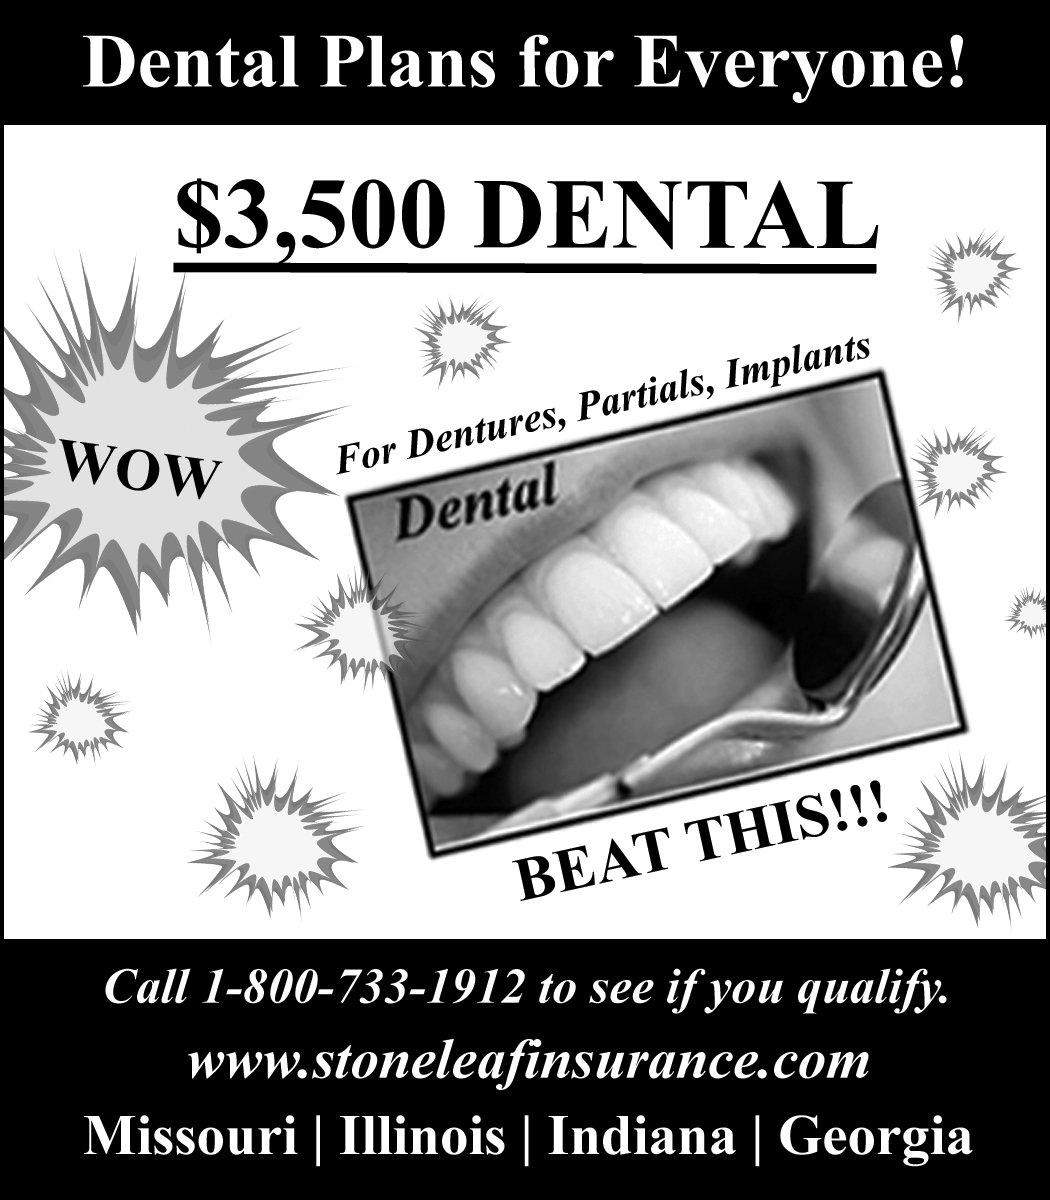 Dental Plans for Everyone!